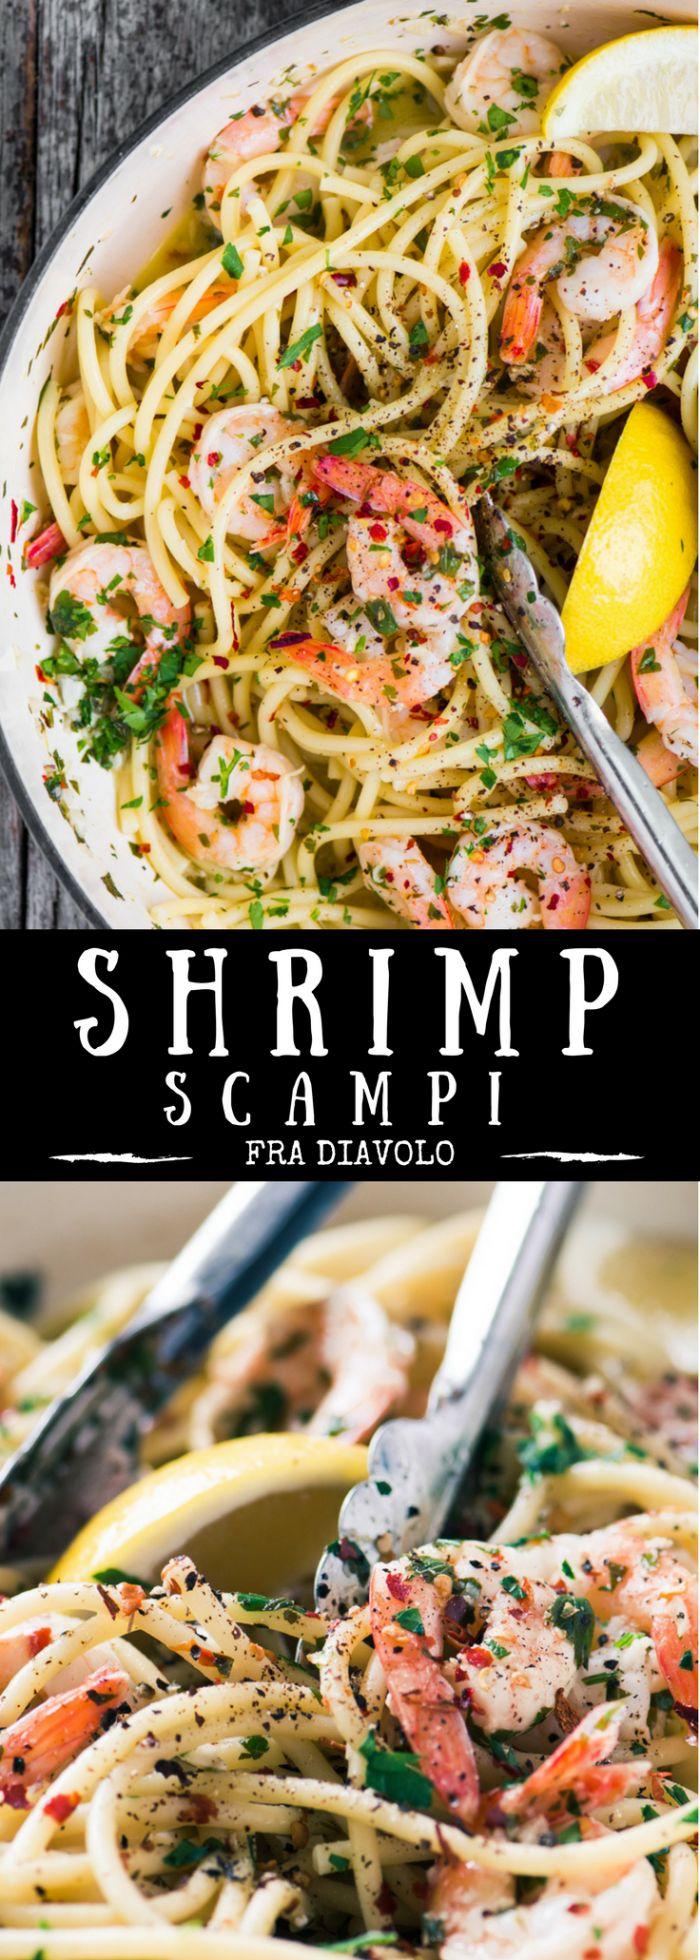 Shrimp Scampi Fra Diavolo ~ Healthy   Frozen Shrimp   Romantic   30 Minute Meal   Italian Pasta ~ theviewfromgreatisland.com